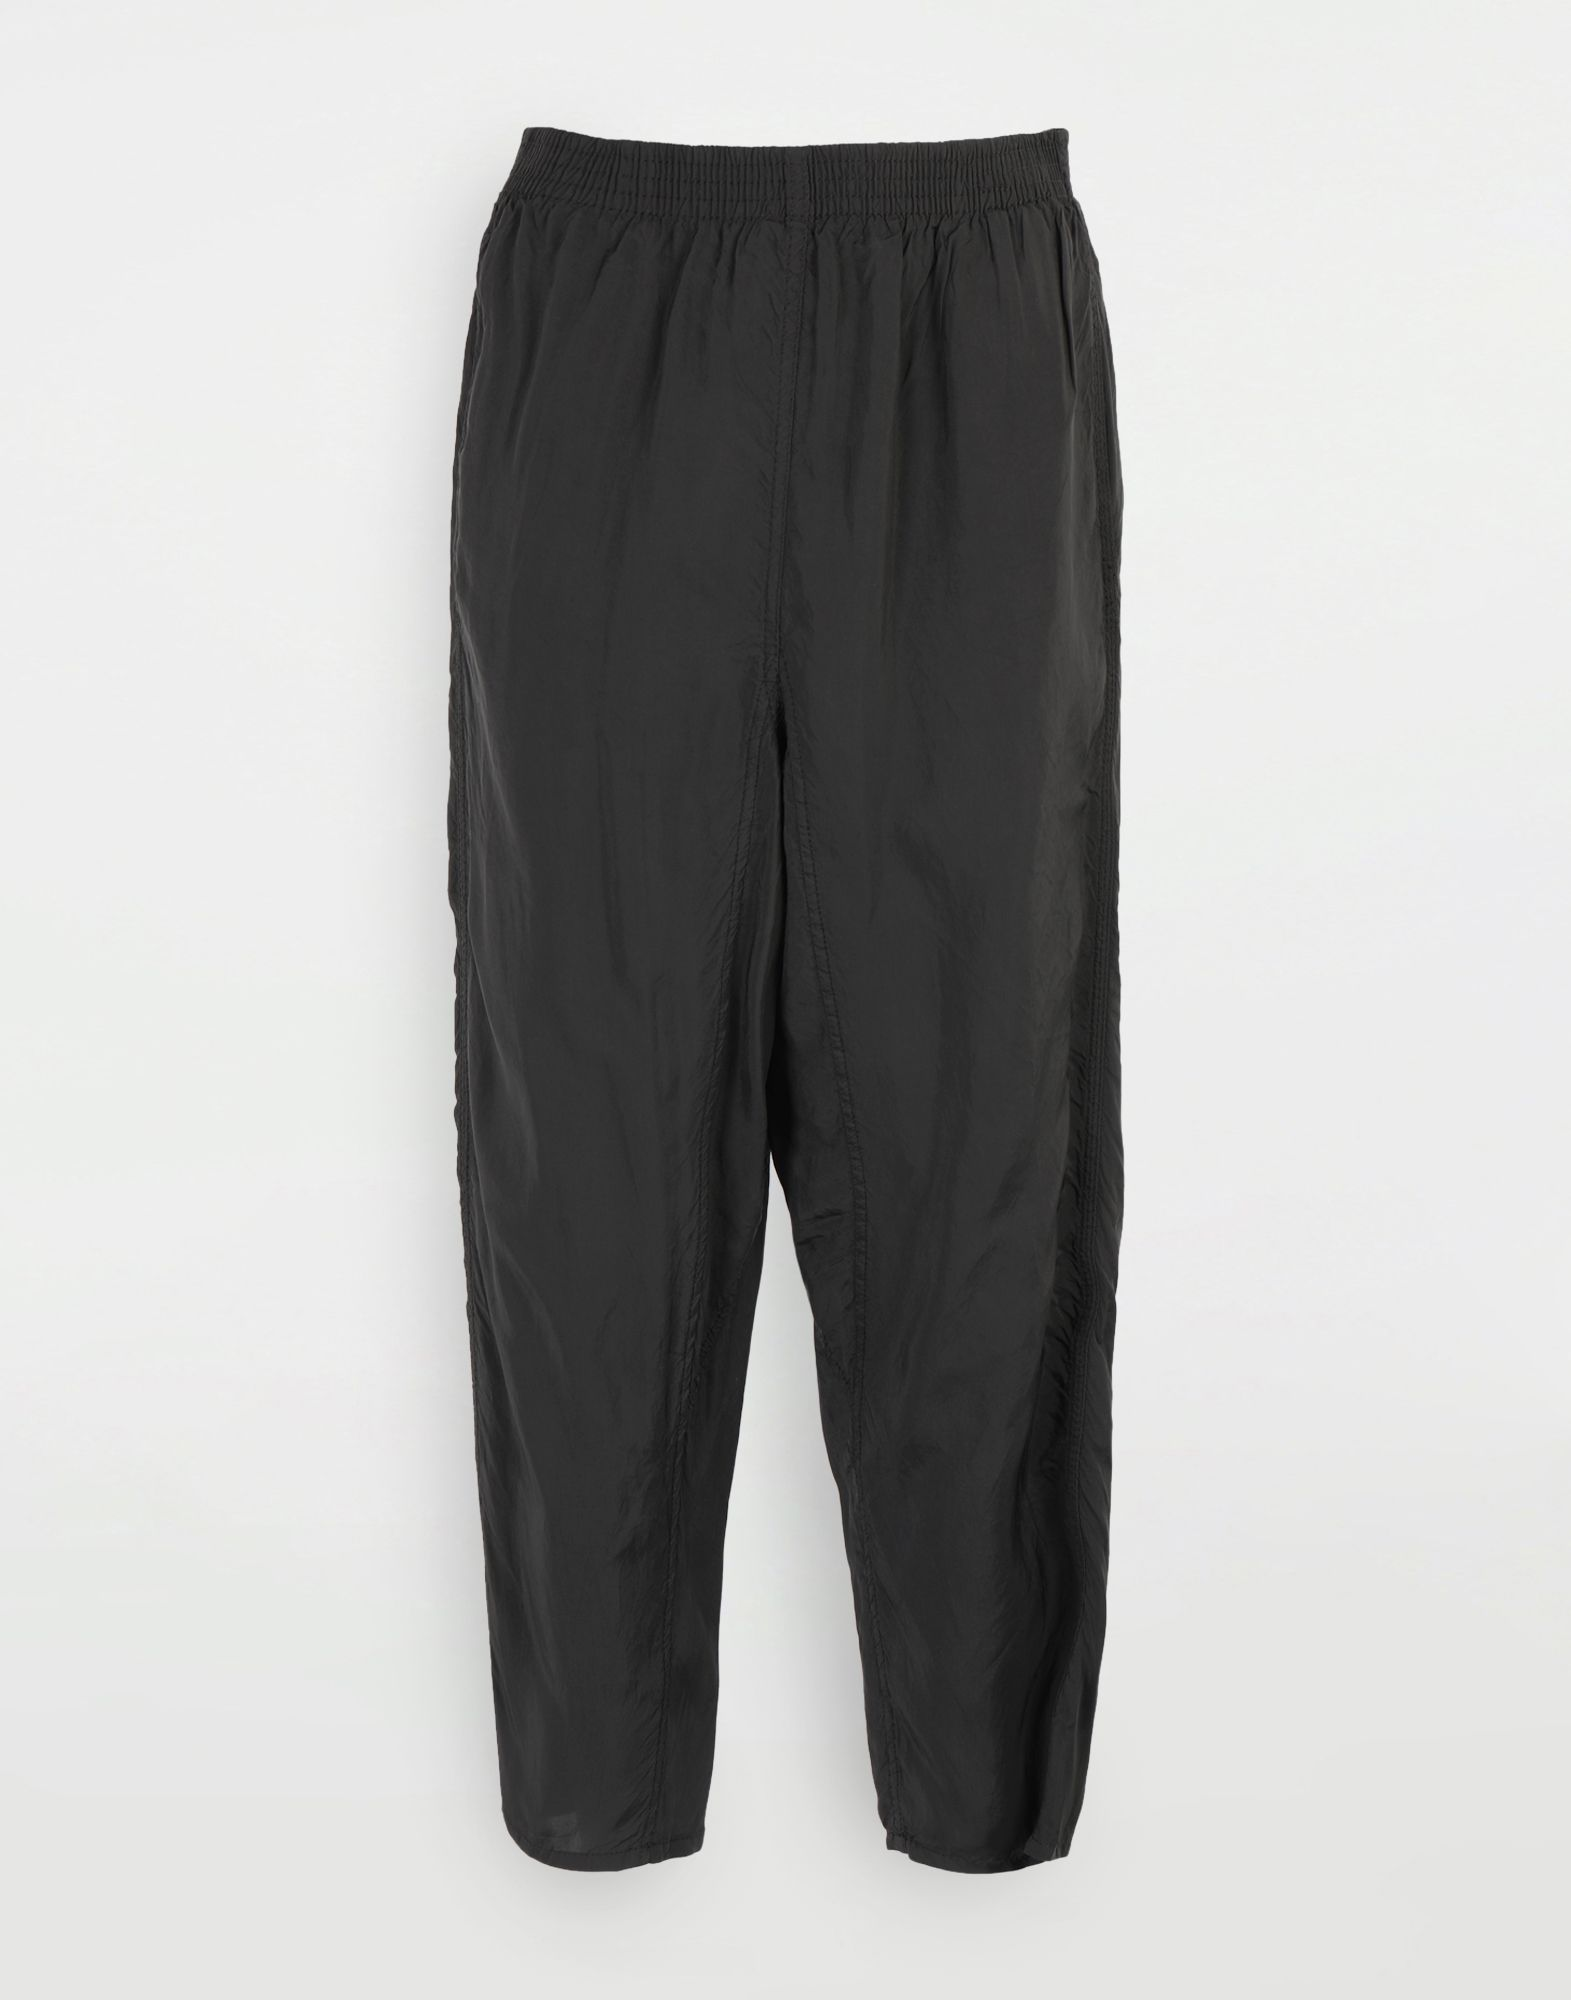 MM6 MAISON MARGIELA Casual pants Woman f